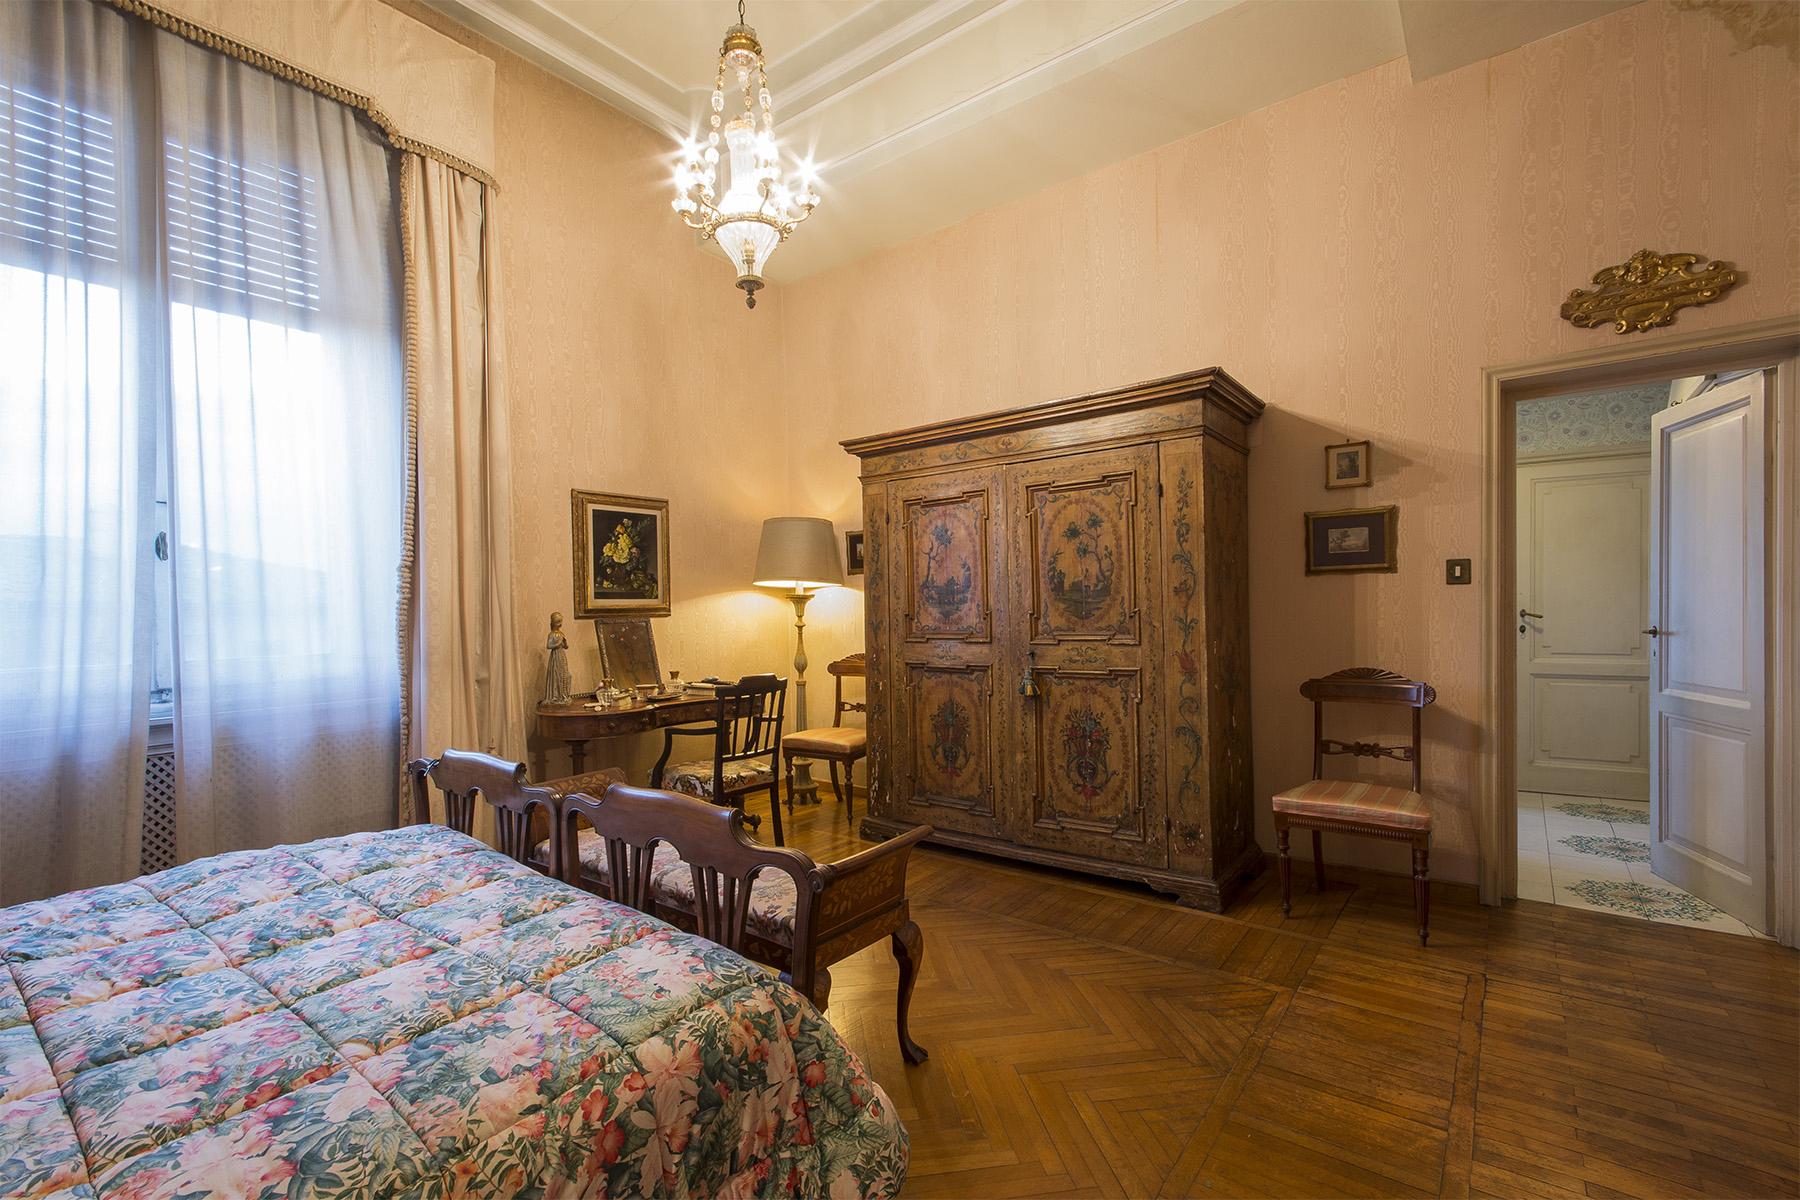 Attico in Vendita a Firenze: 5 locali, 400 mq - Foto 12